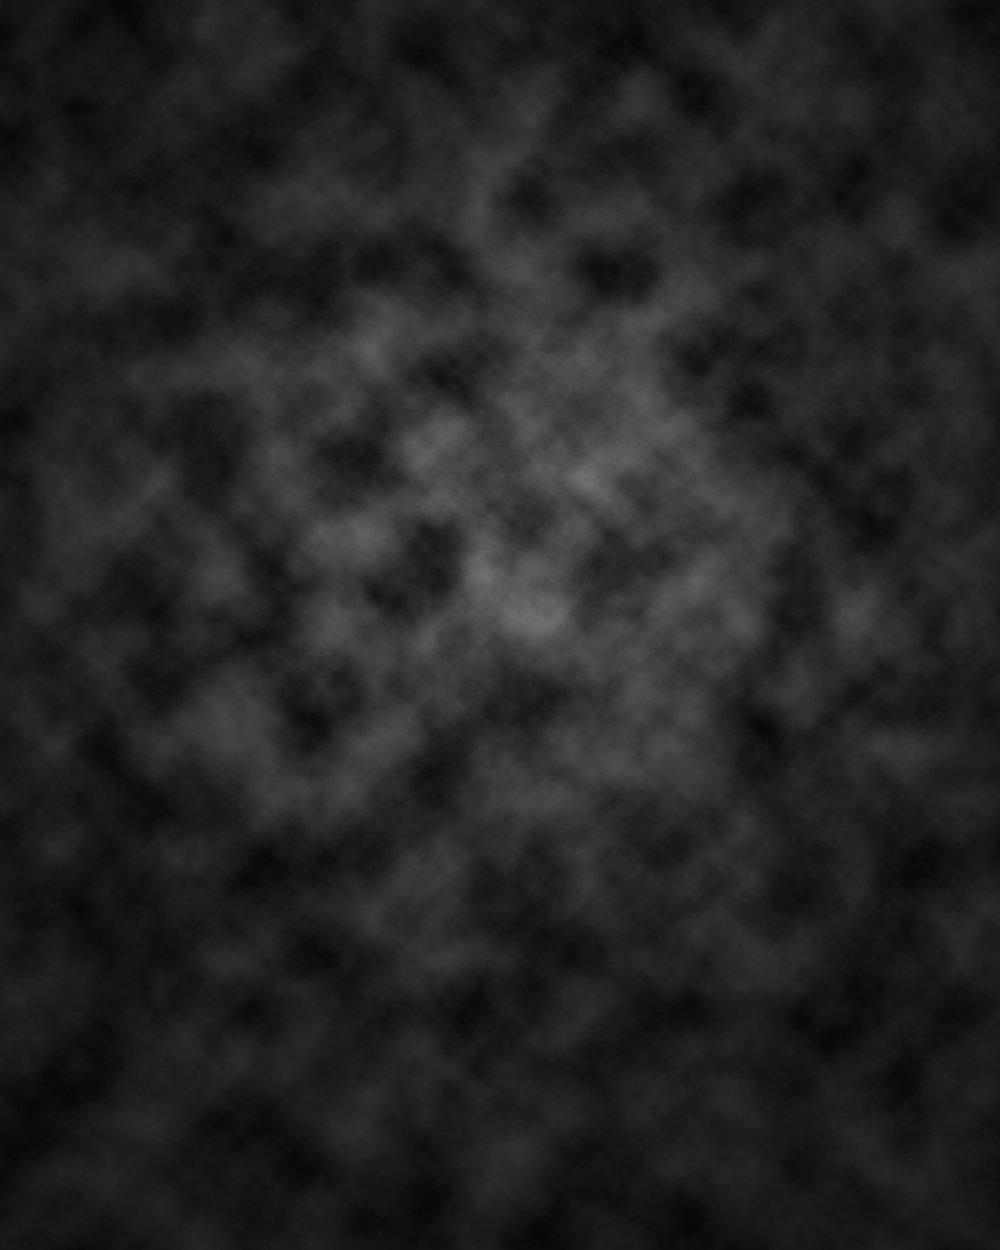 Background Option #3 - Black